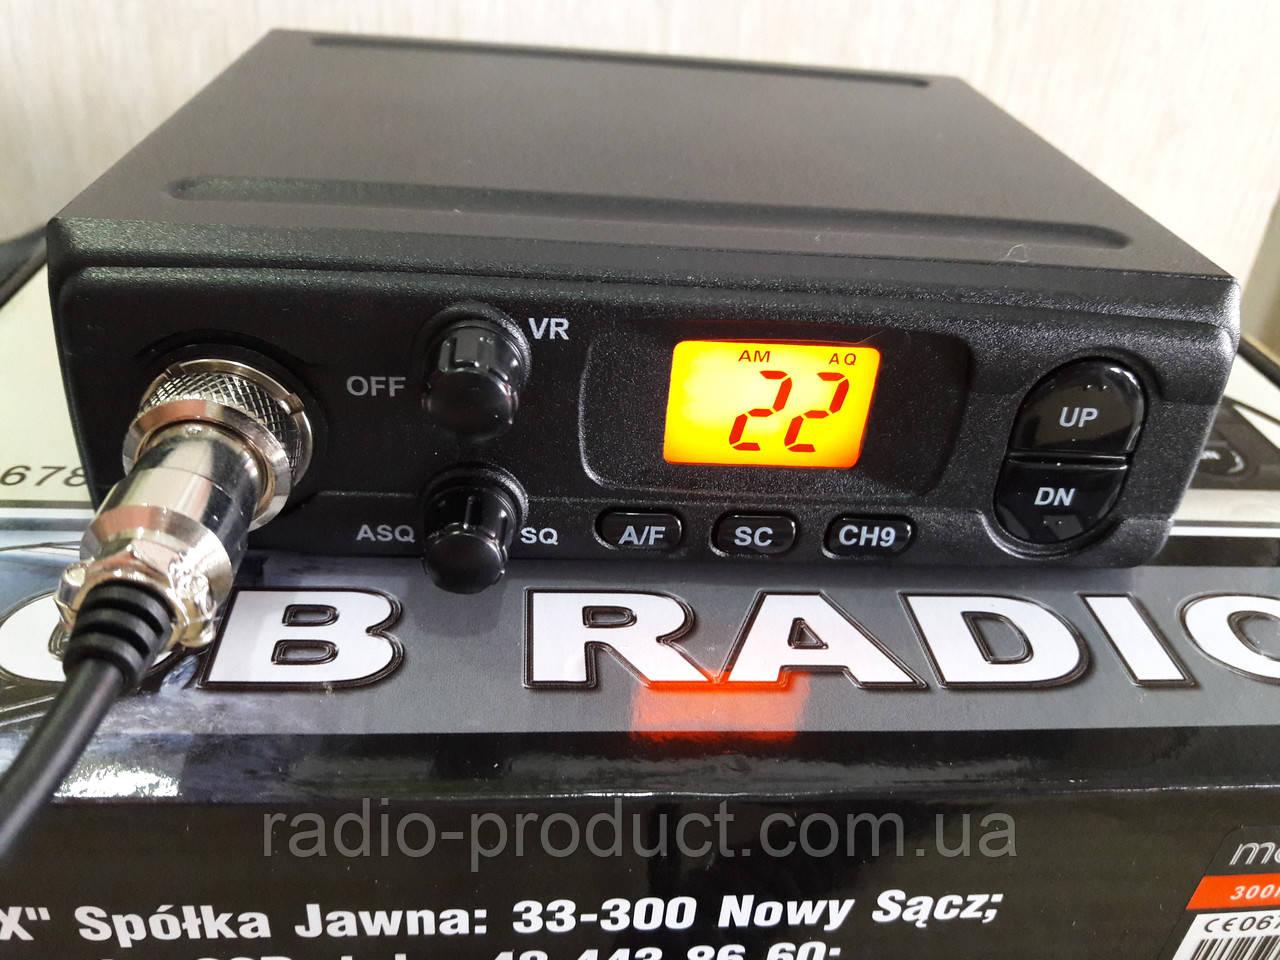 Merx Symfonia 300M (Megajet MJ-300) Си-Би радиостанция 27 МГц